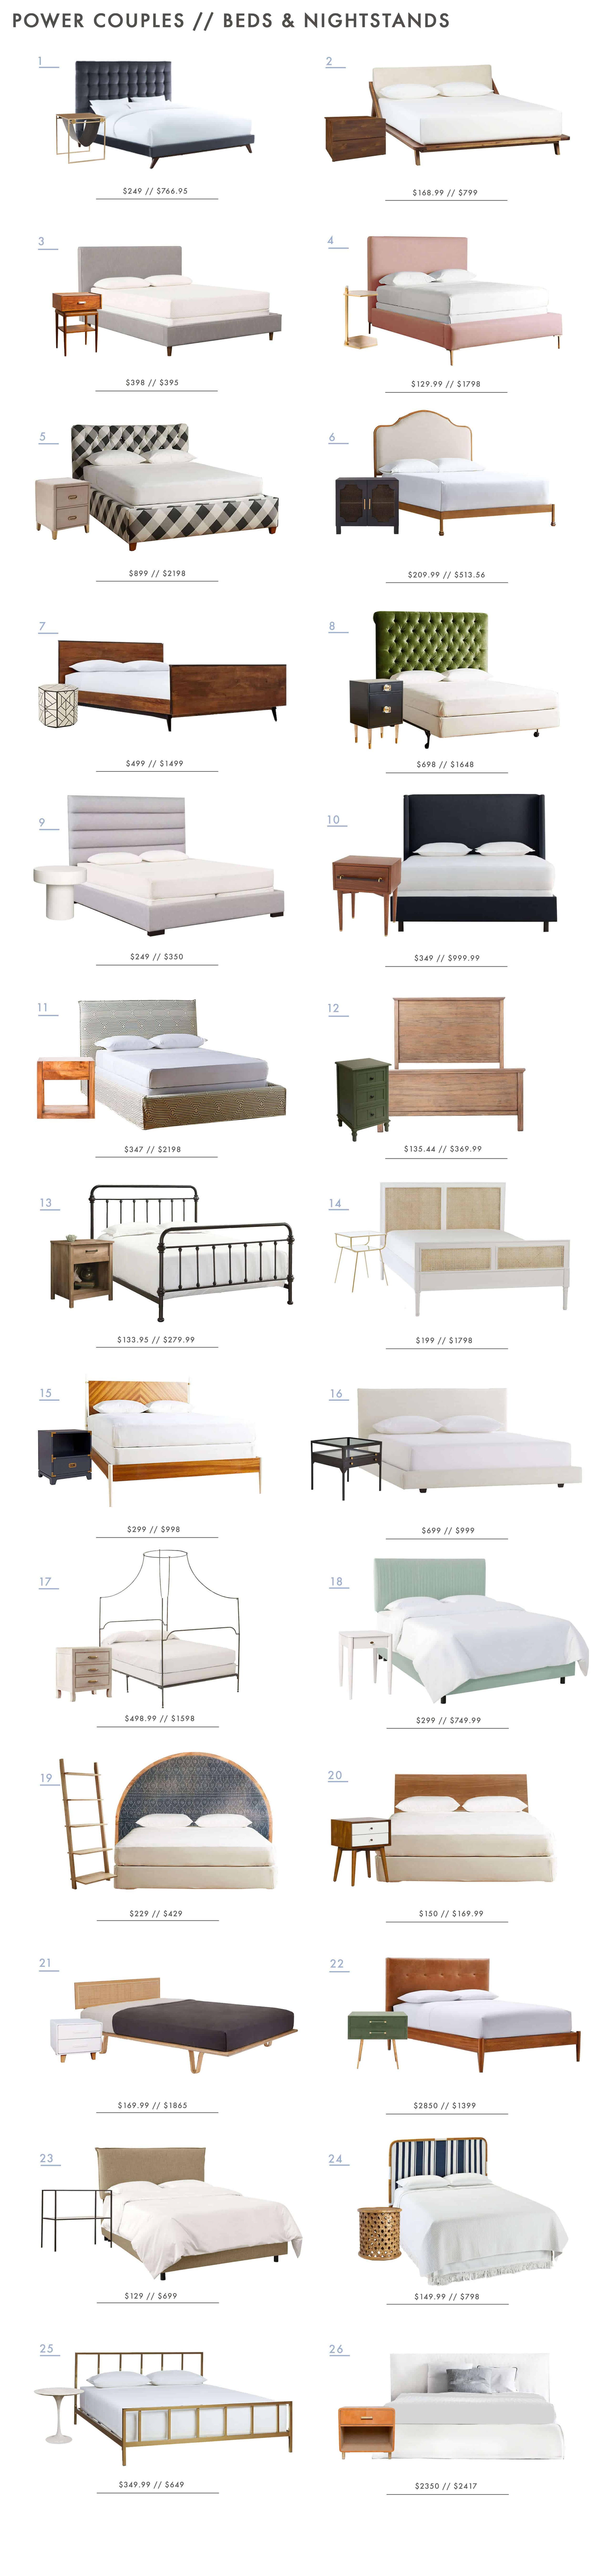 emily-henderson_power-couples_beds_nightstands_roundup_2